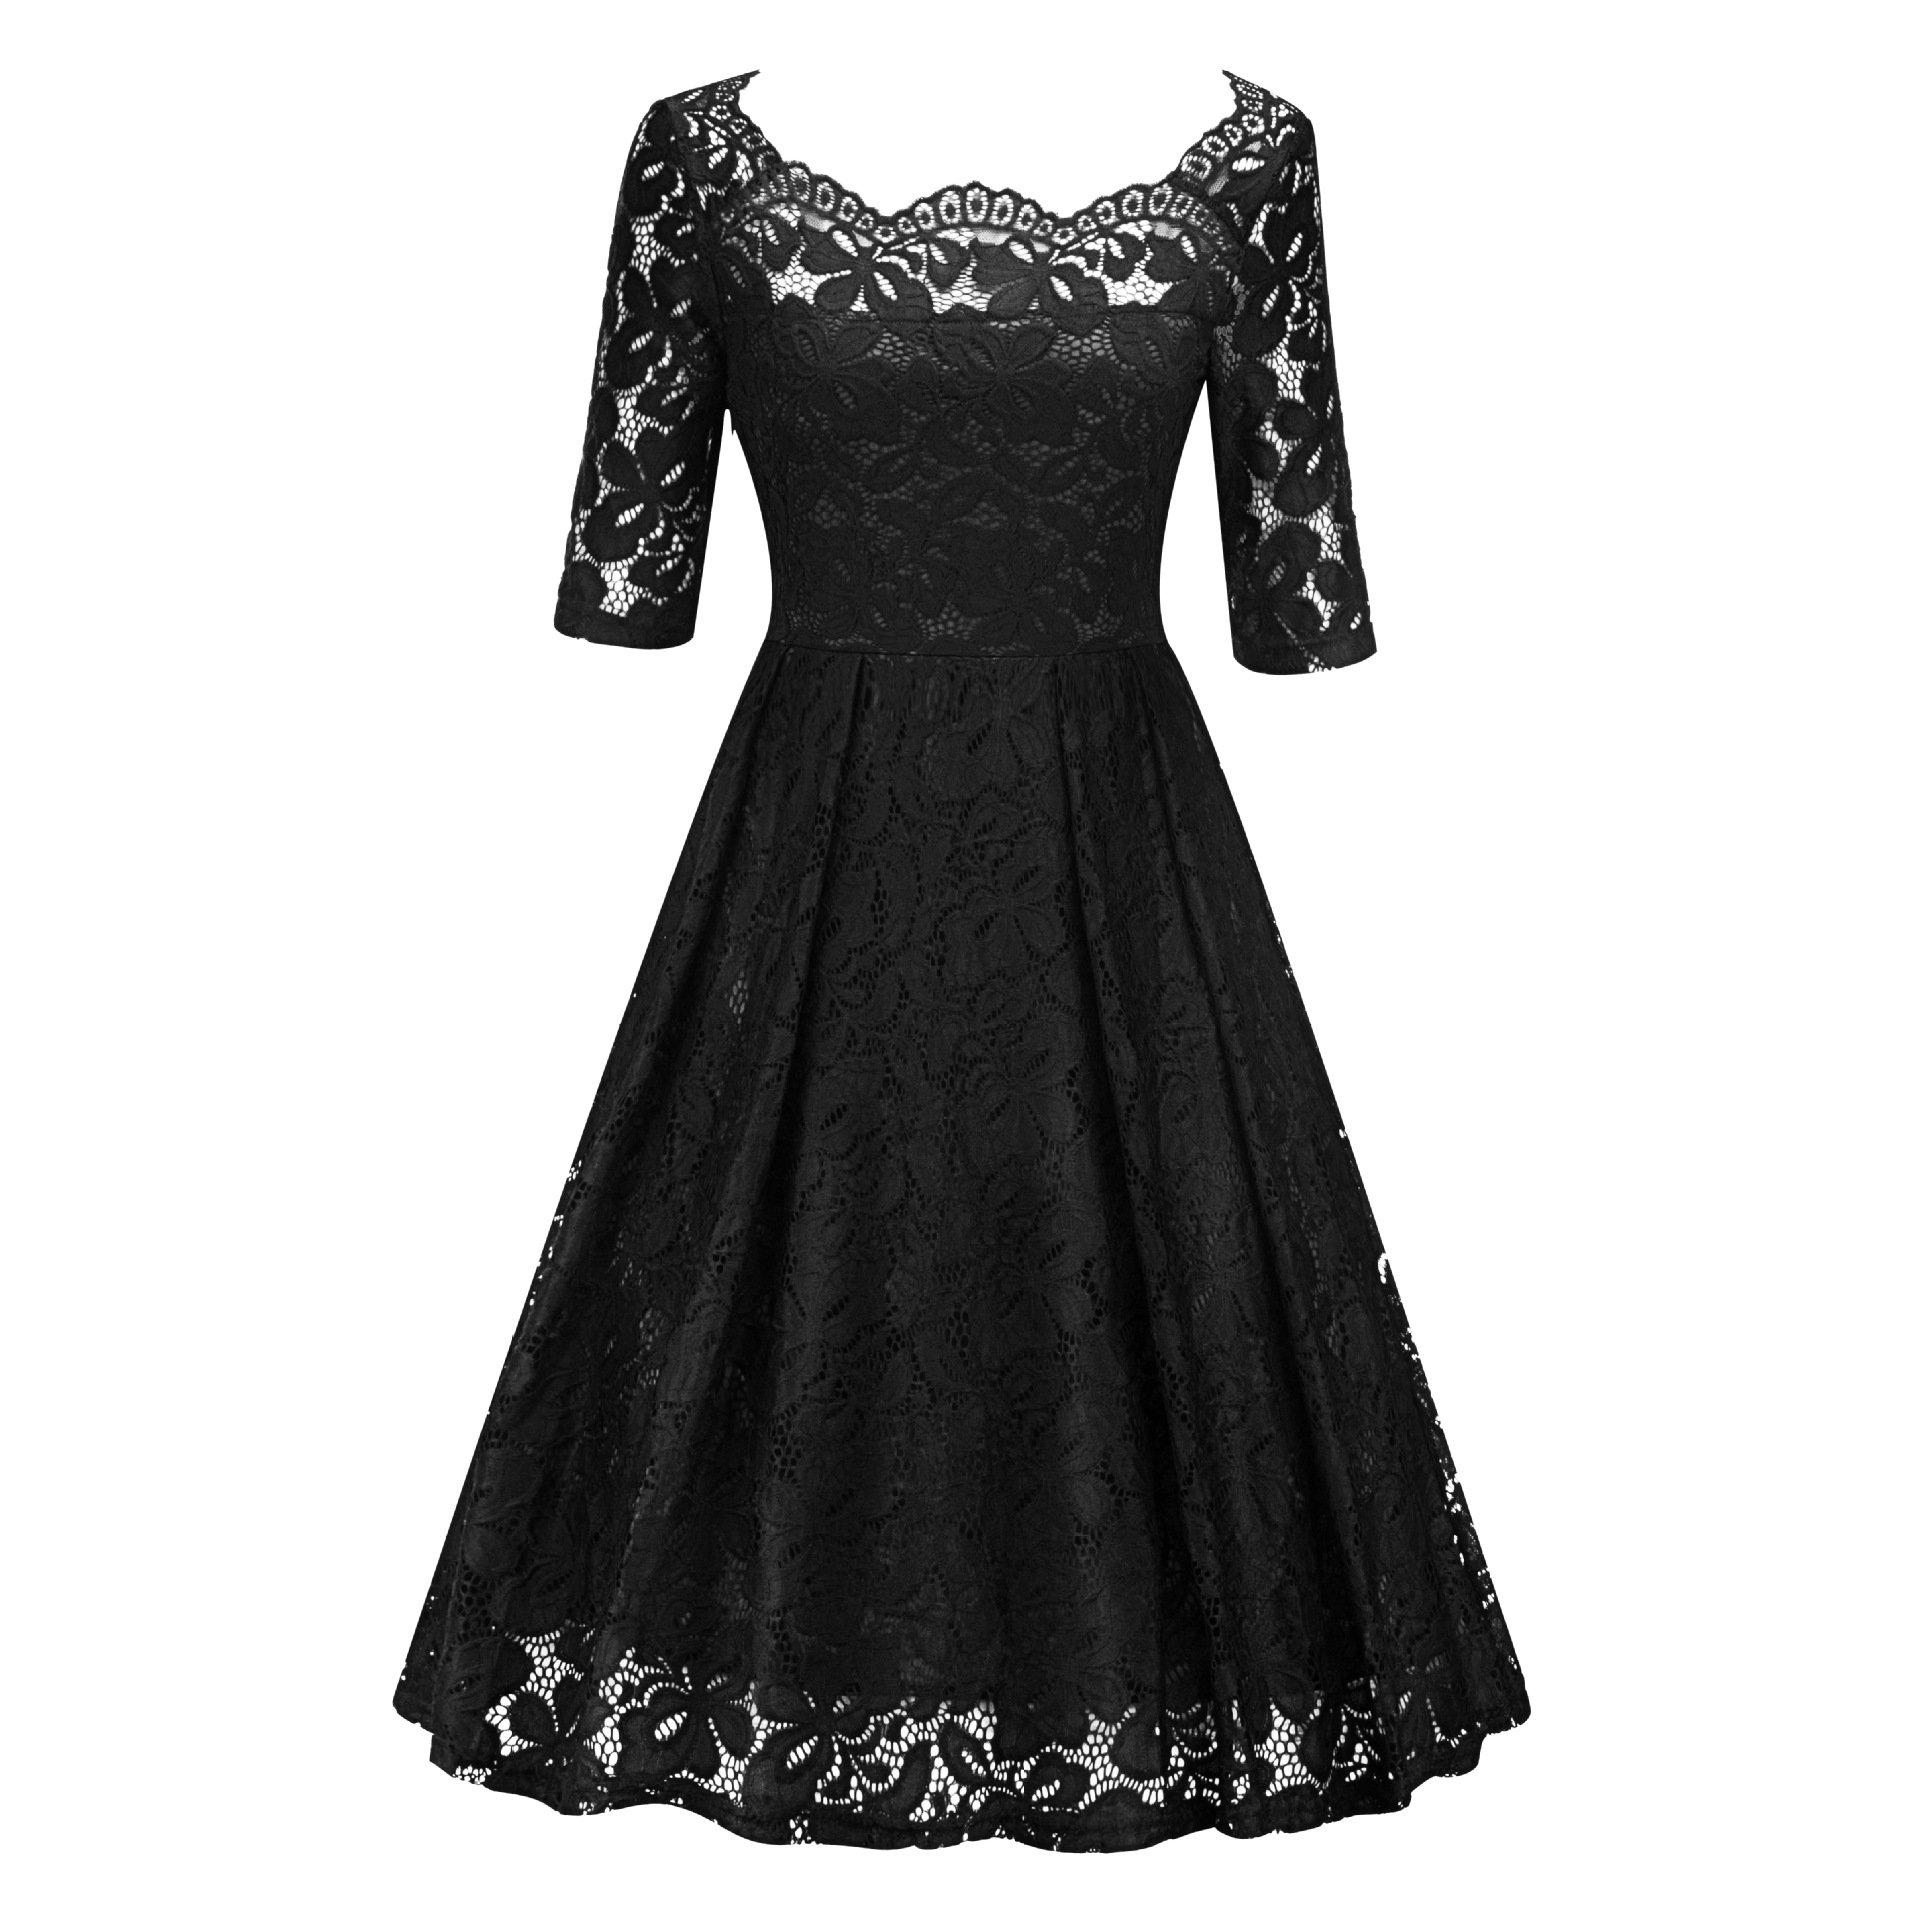 DINGTOOL Women's Vintage Floral Lace Dress Bodycon Bridesmaid Cocktail Party Wedding Formal Swing Dress (Black, L)